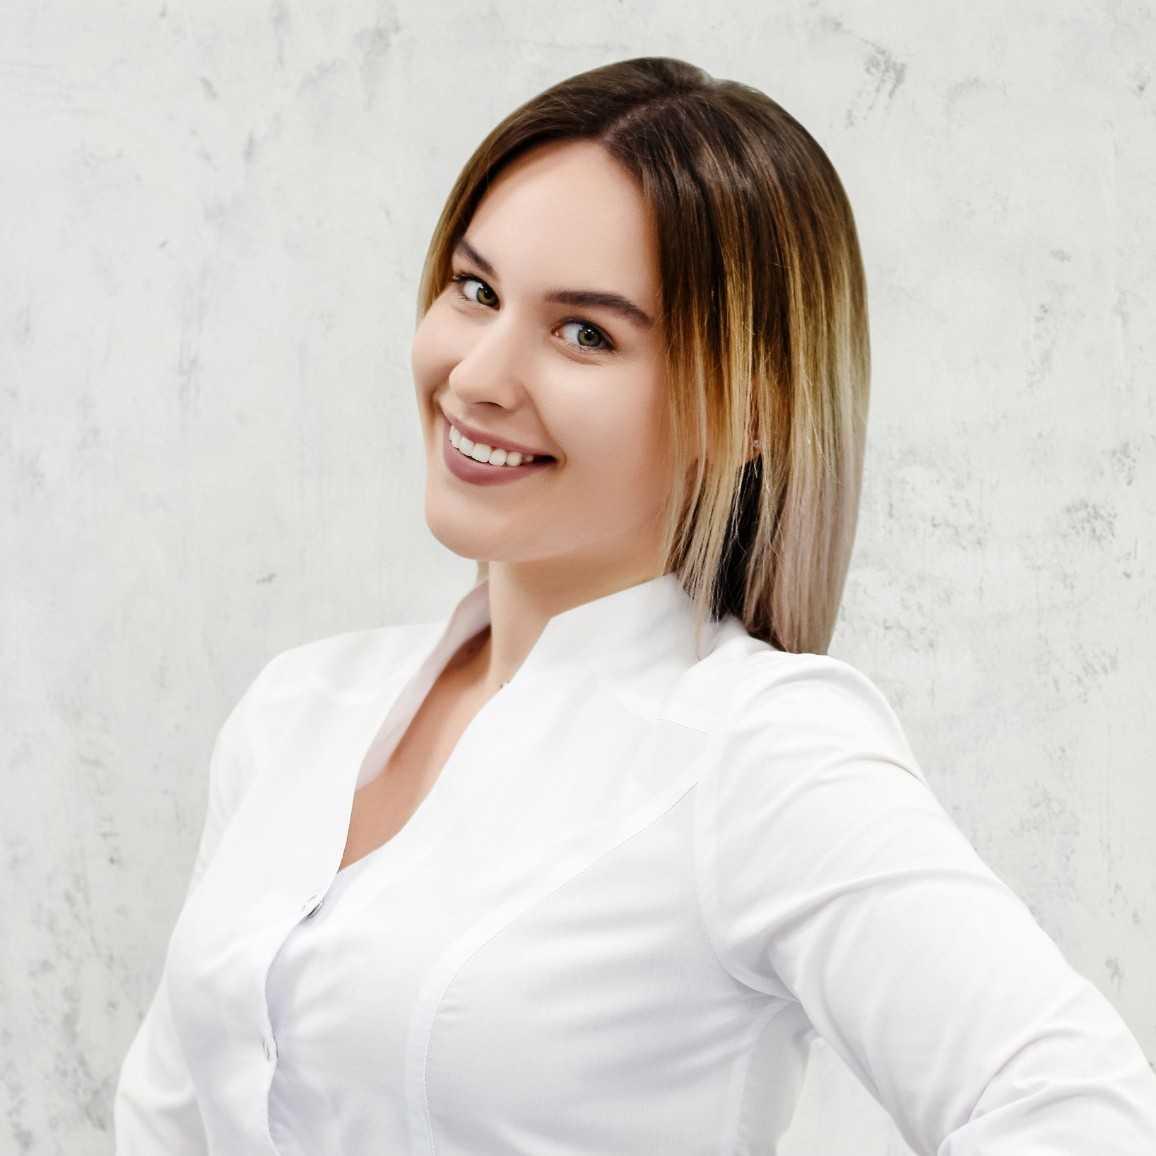 Чередниченко Лада Викторовна - фотография